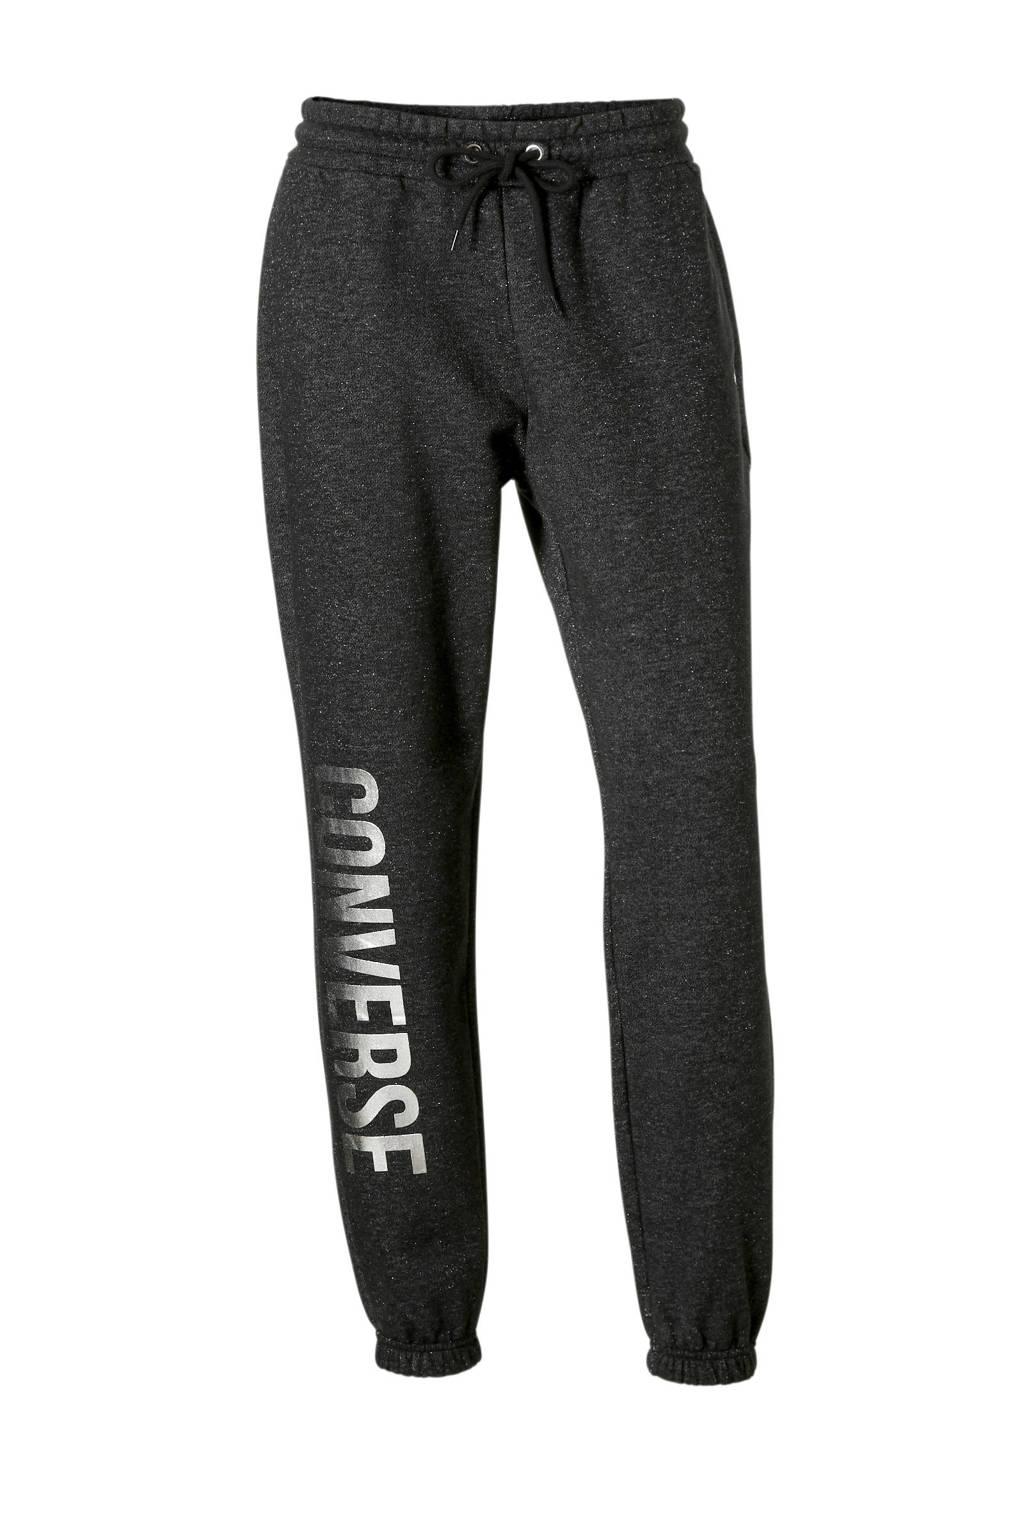 Converse joggingbroek zwart, Zwart